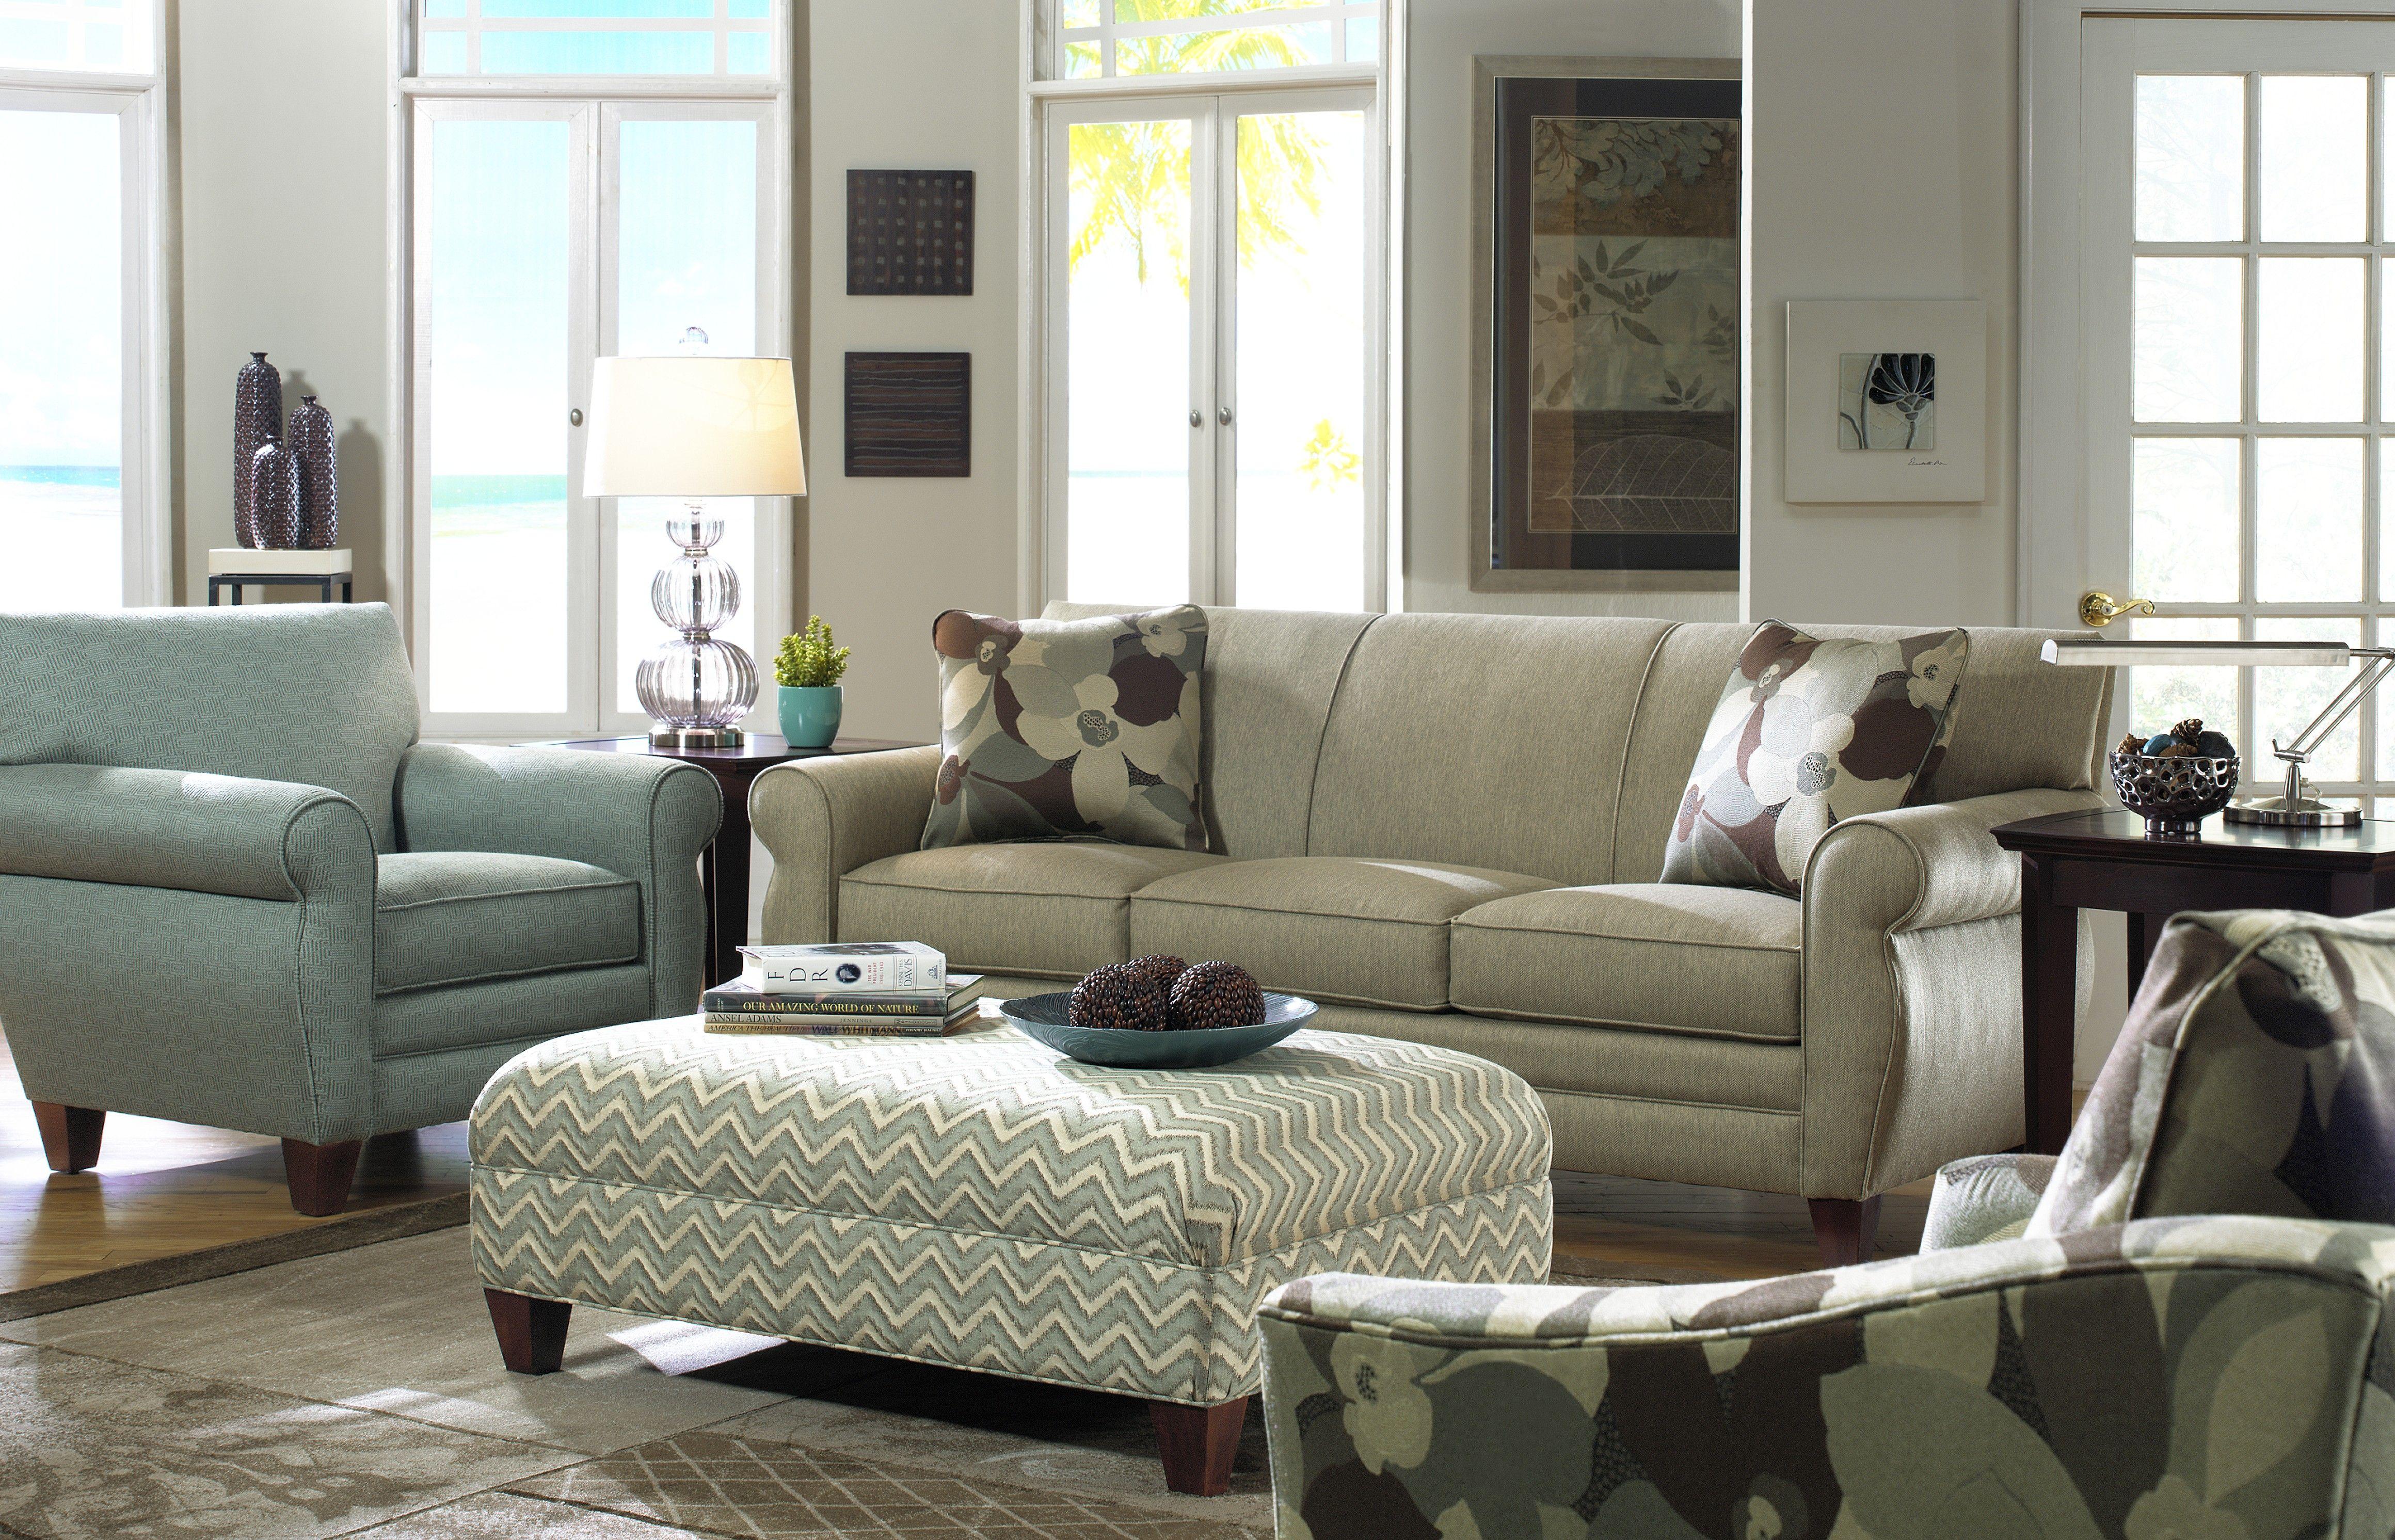 craftmaster  paula deen home collection showroom 2622